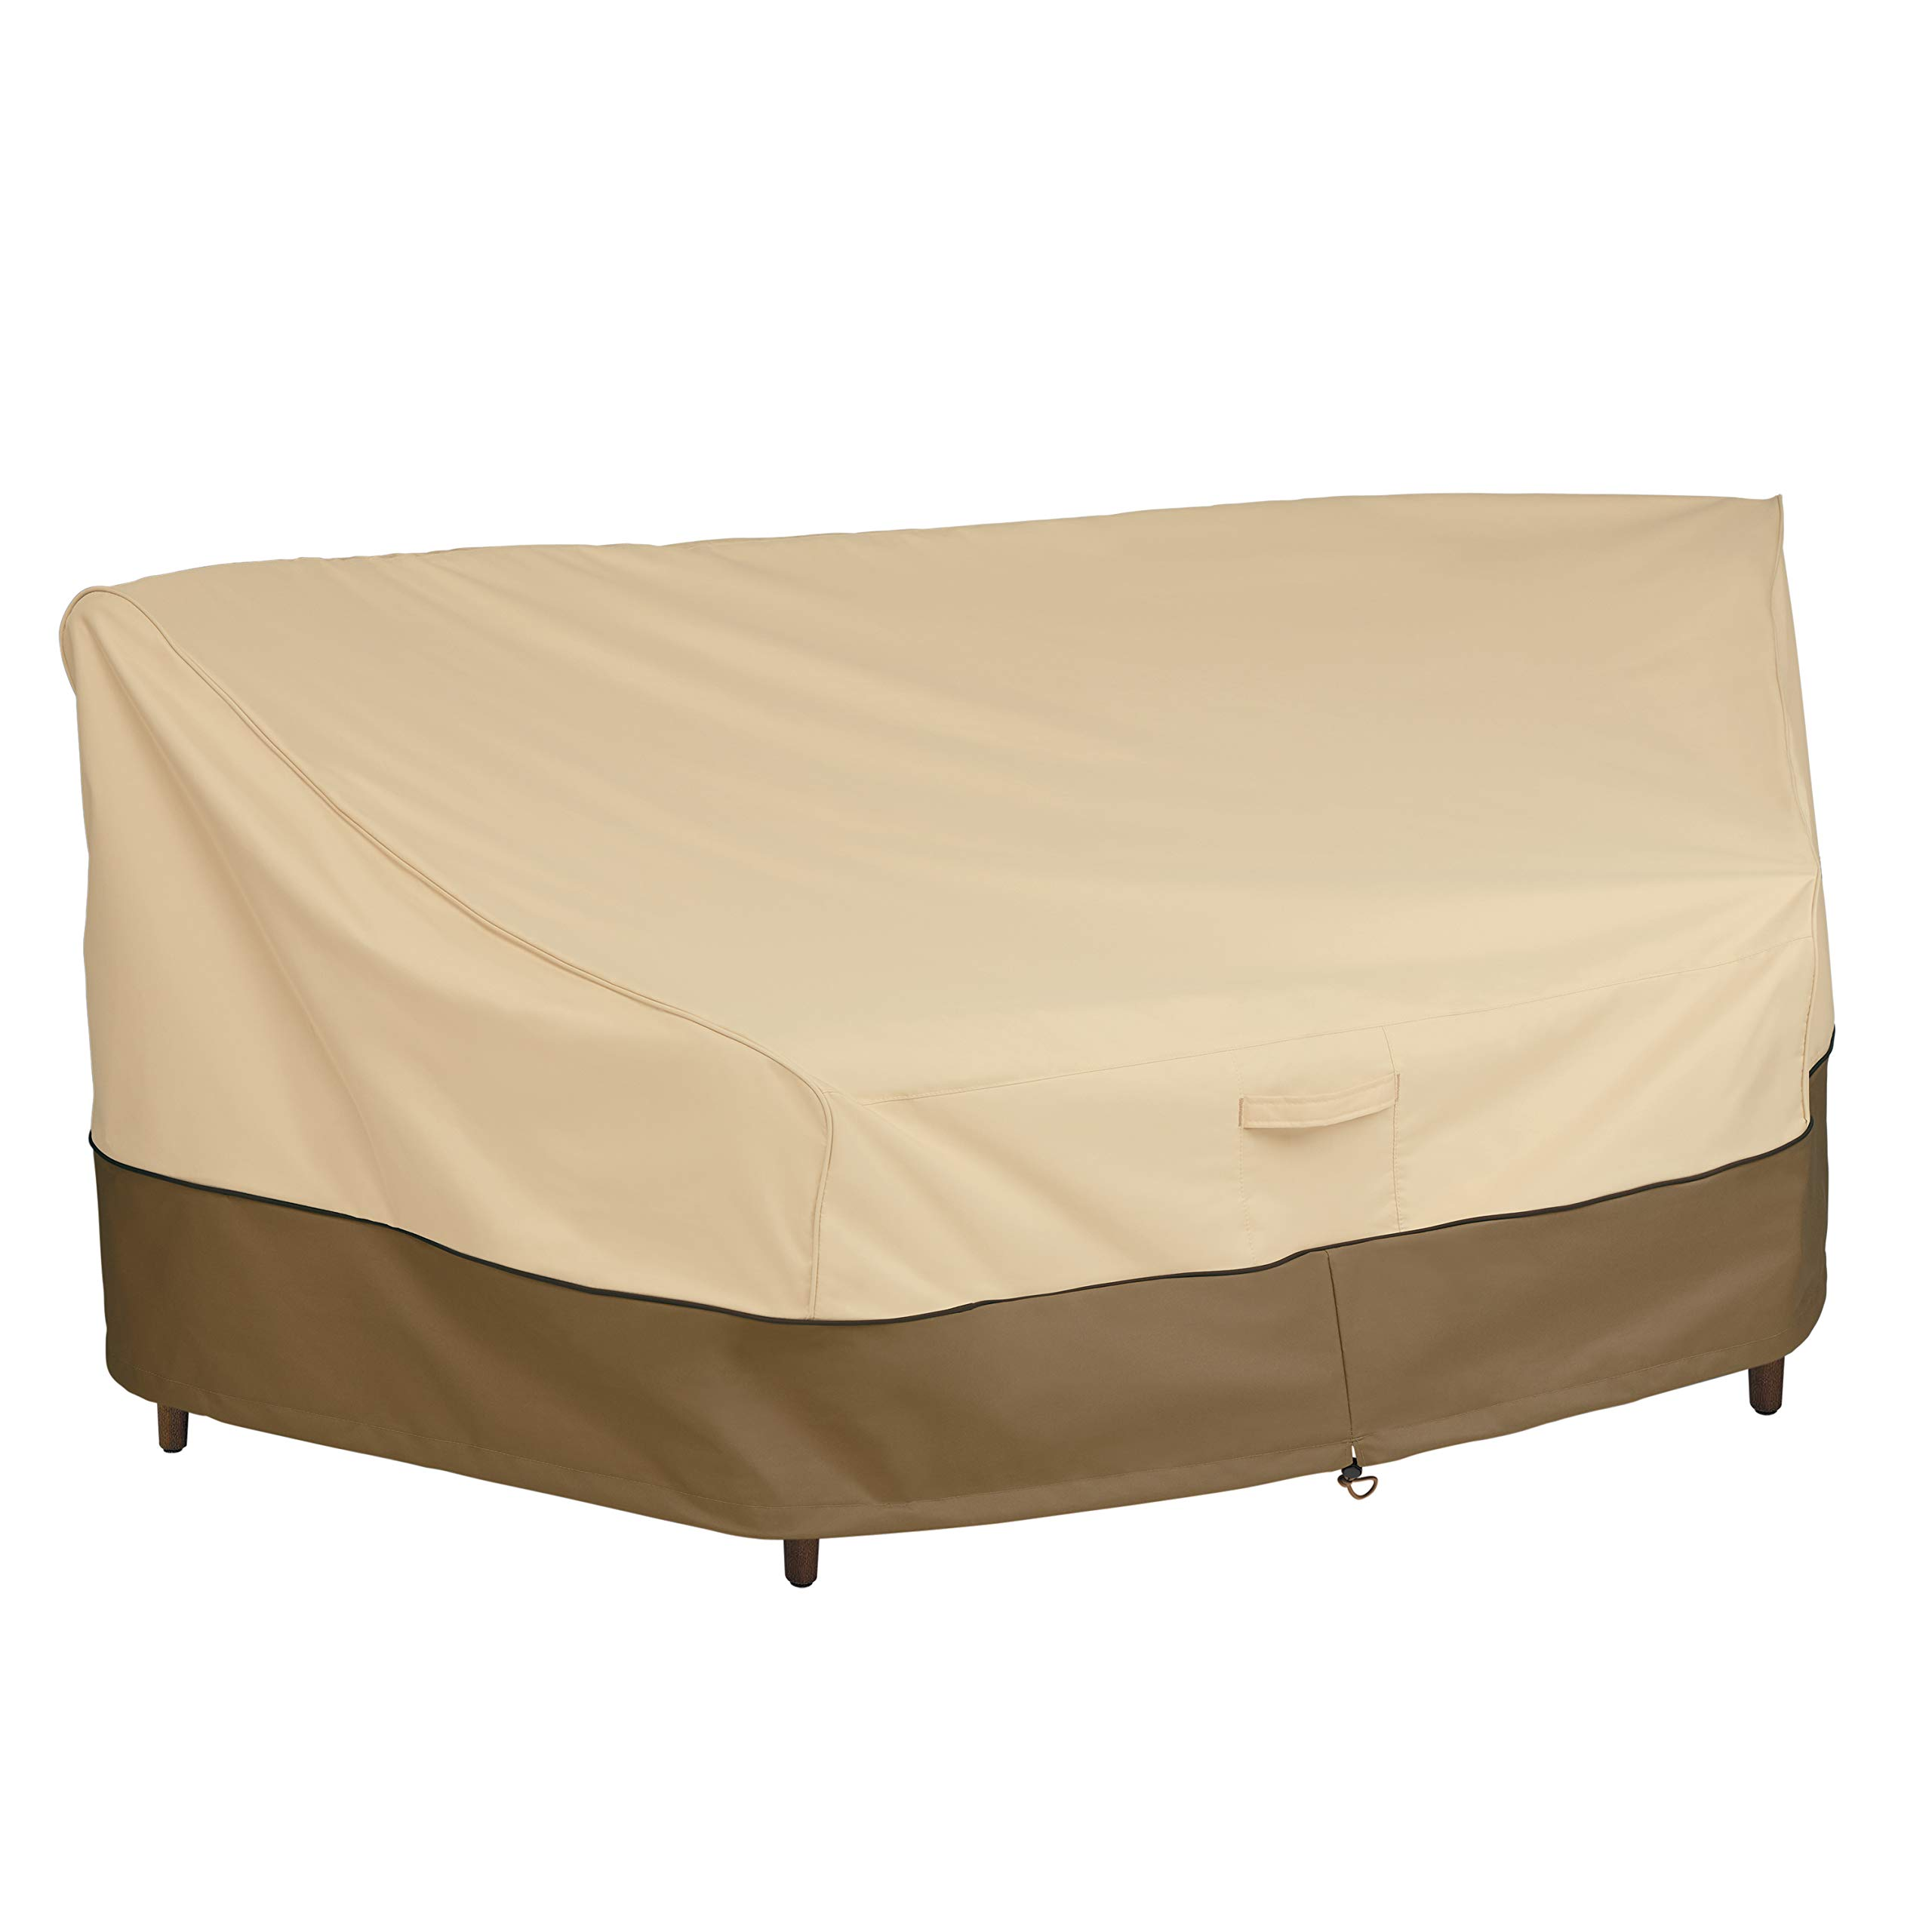 Classic Accessories Veranda Curved Sectional Patio Sofa Cover